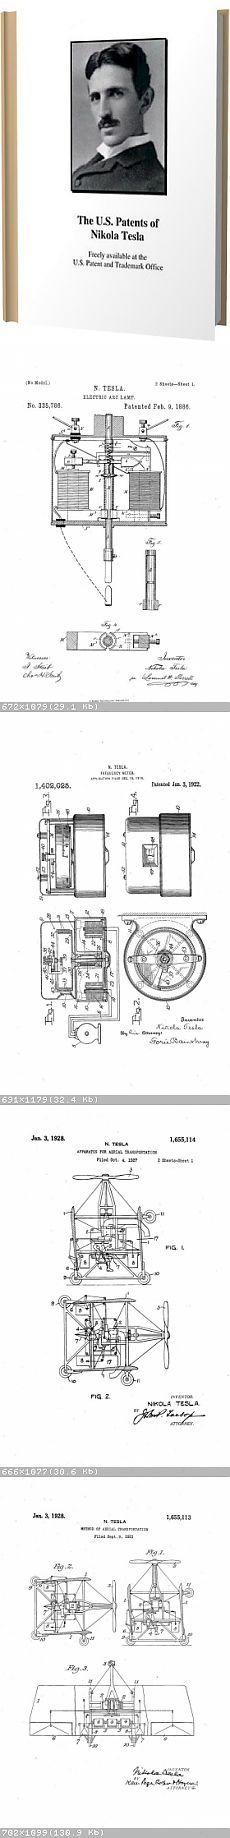 Патенты Николы Теслы / Никола Тесла (1900) PDF (EN)